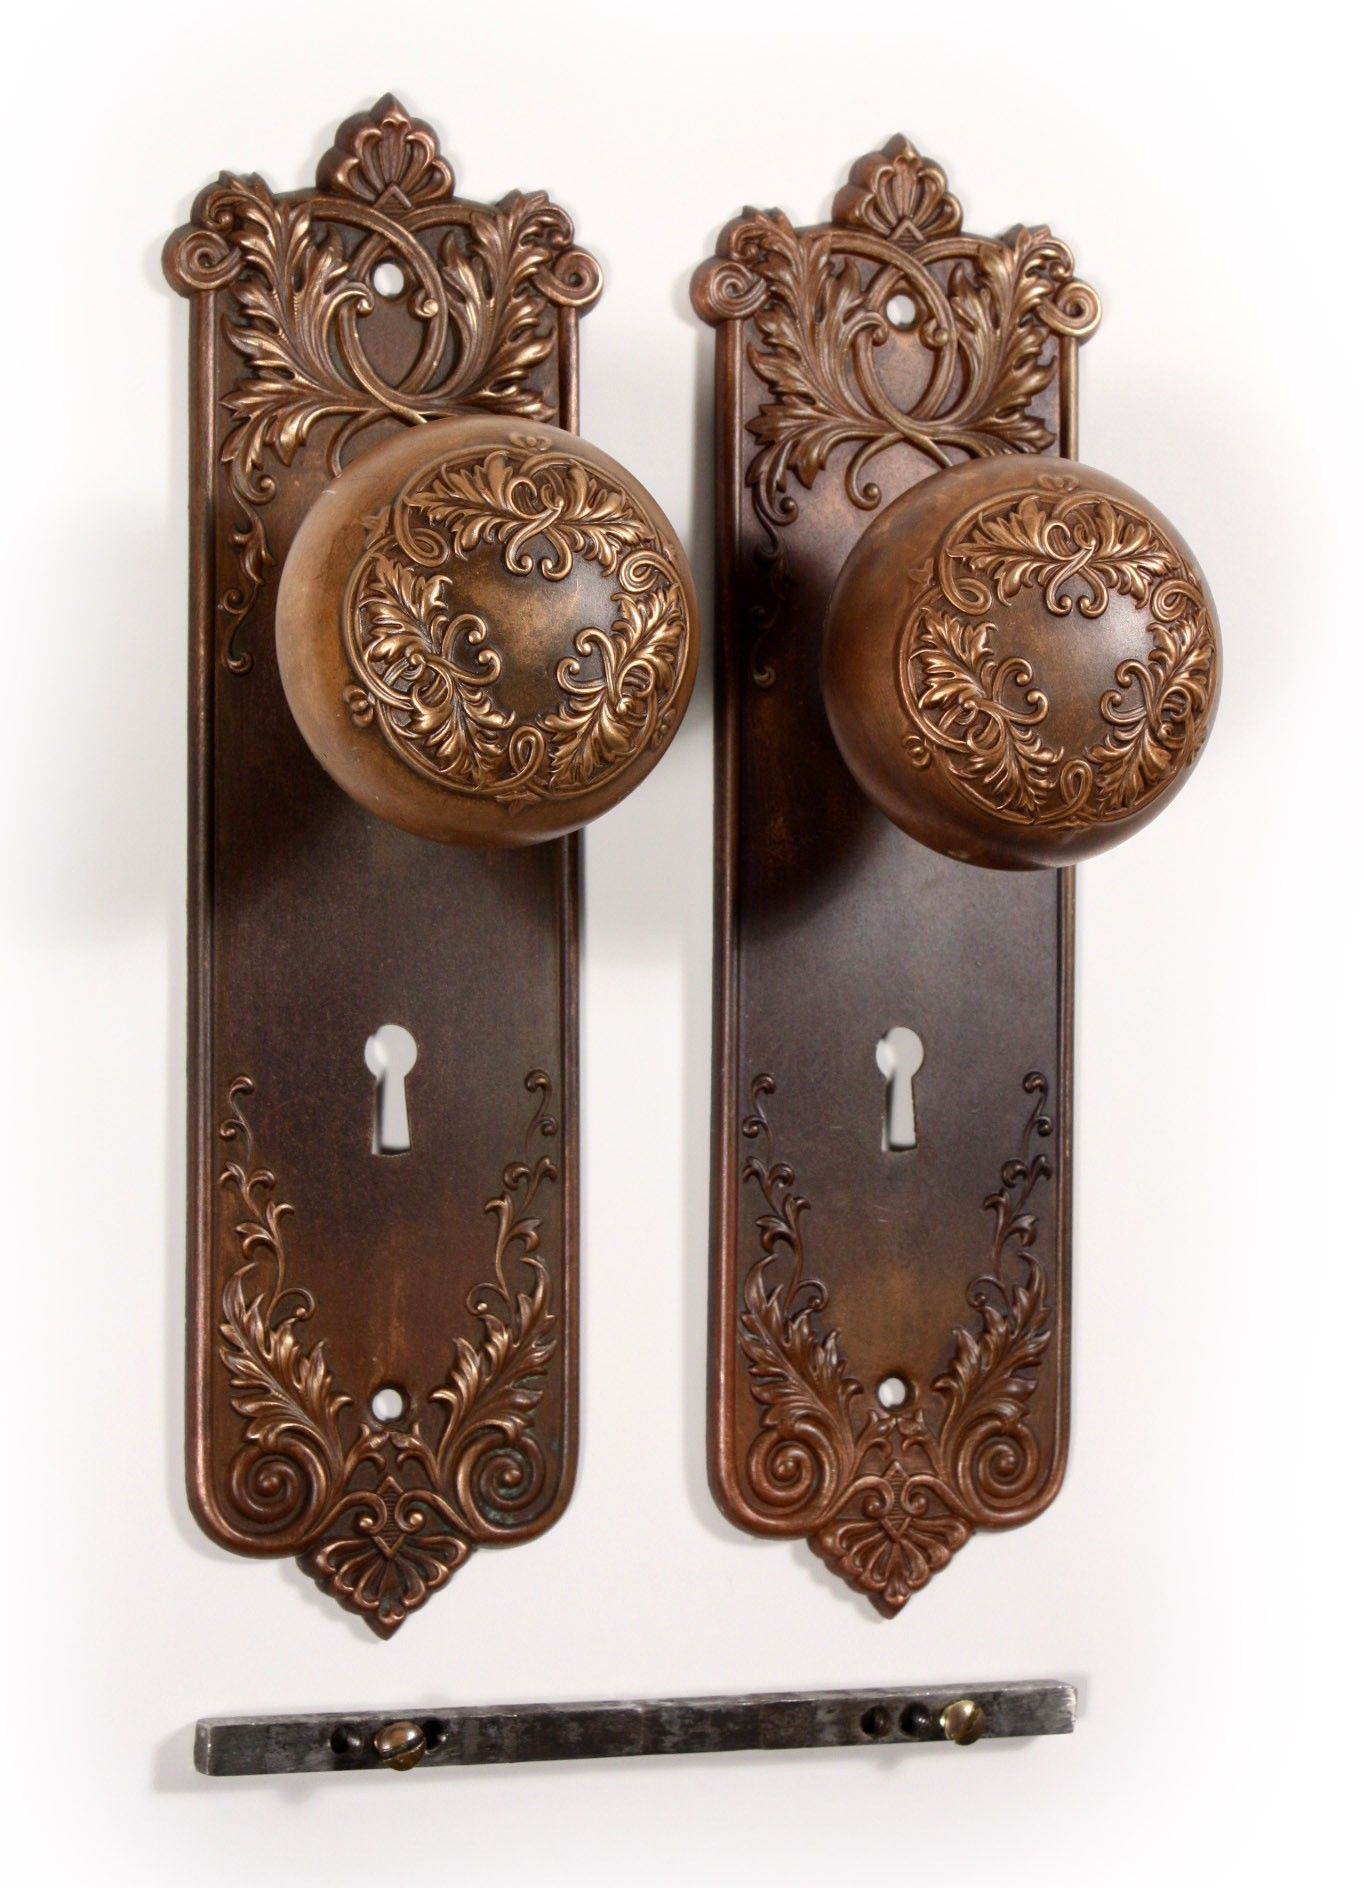 Antique Hardware, Home Hardware, Antique French Doors, Antique Art,  Porcelain Door Knobs